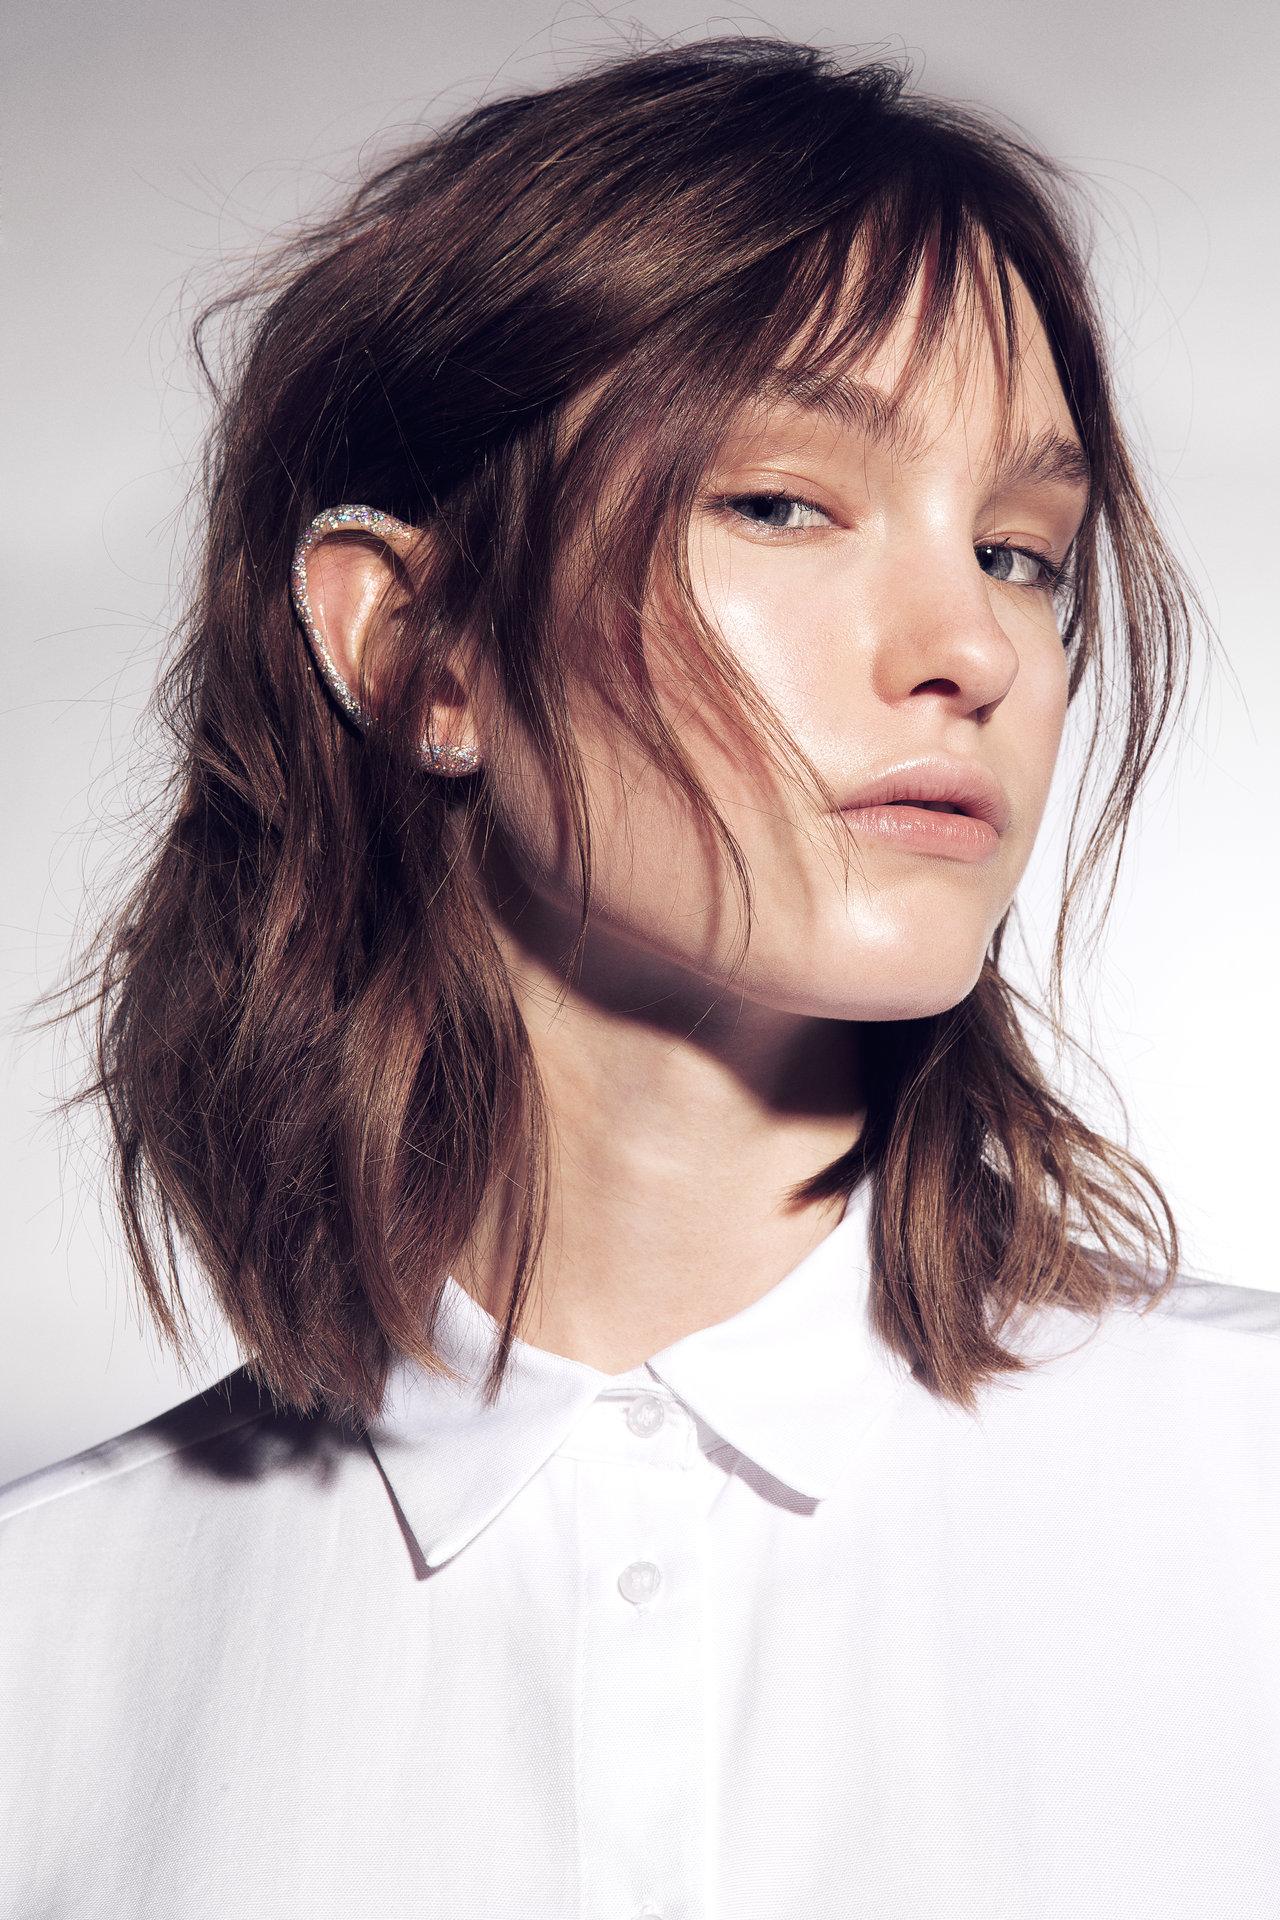 JUTE MAGAZINE I Hair, Makeup & Manicure: Melanie Volkart Styling: Mimmi Schöldström Stucki Photographer: Ellin Anderegg